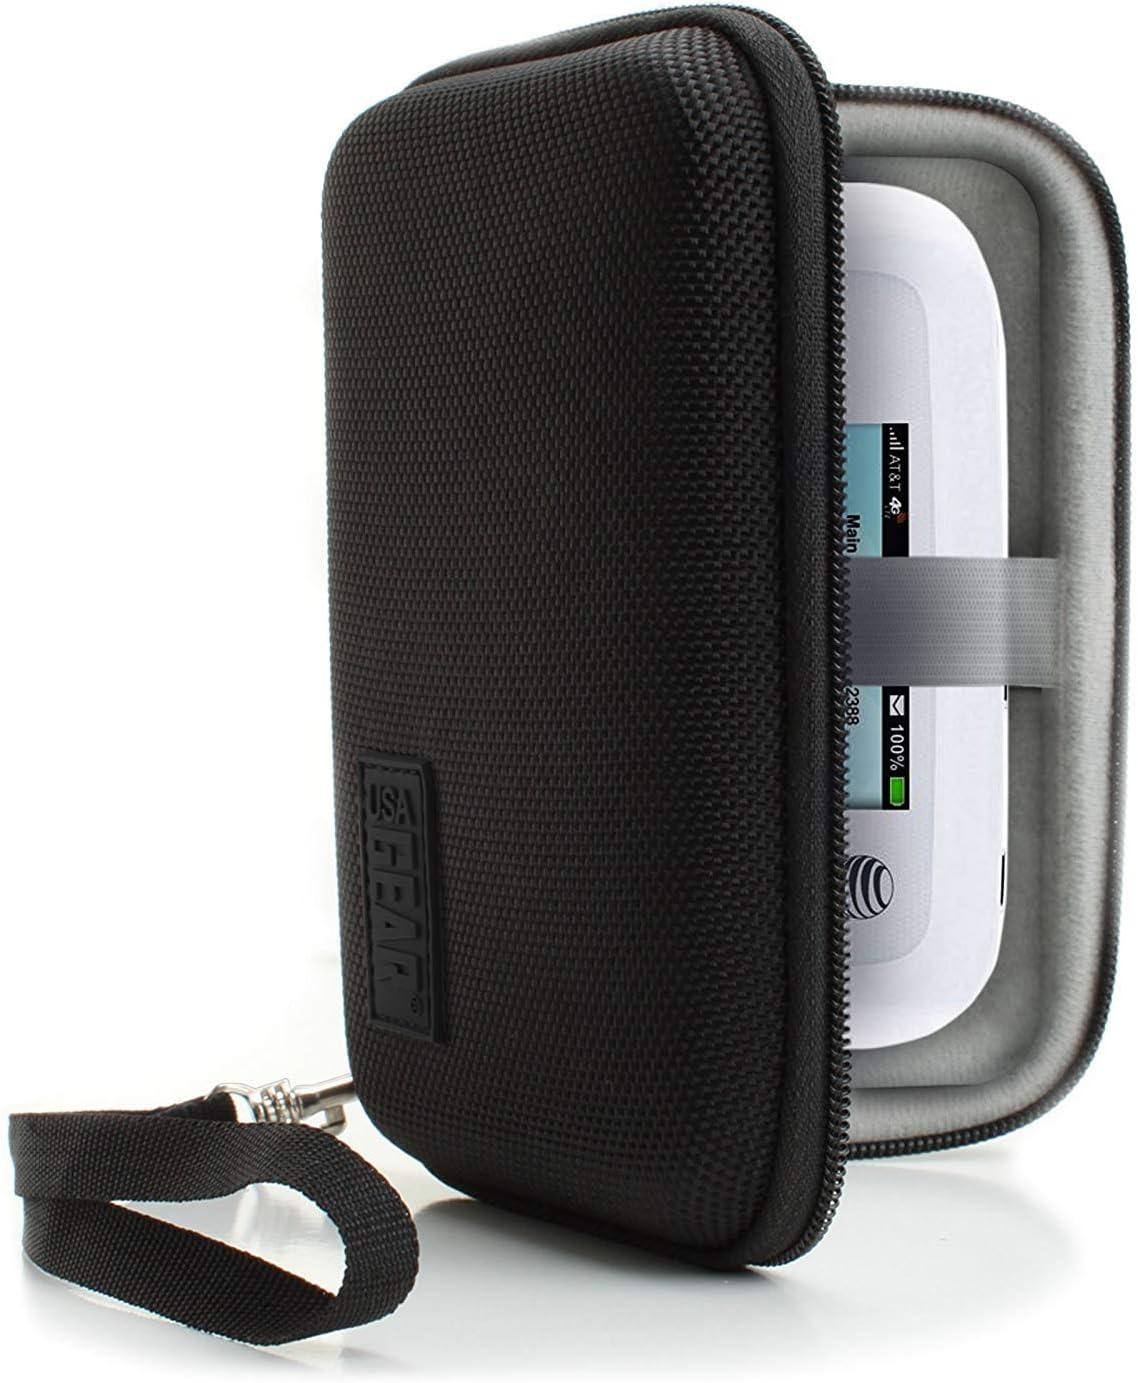 Accessory Power USA GEAR Mobile HotSpot Wifi - Funda Rígida, Portátil, Universal para GPS , Baterías Externas